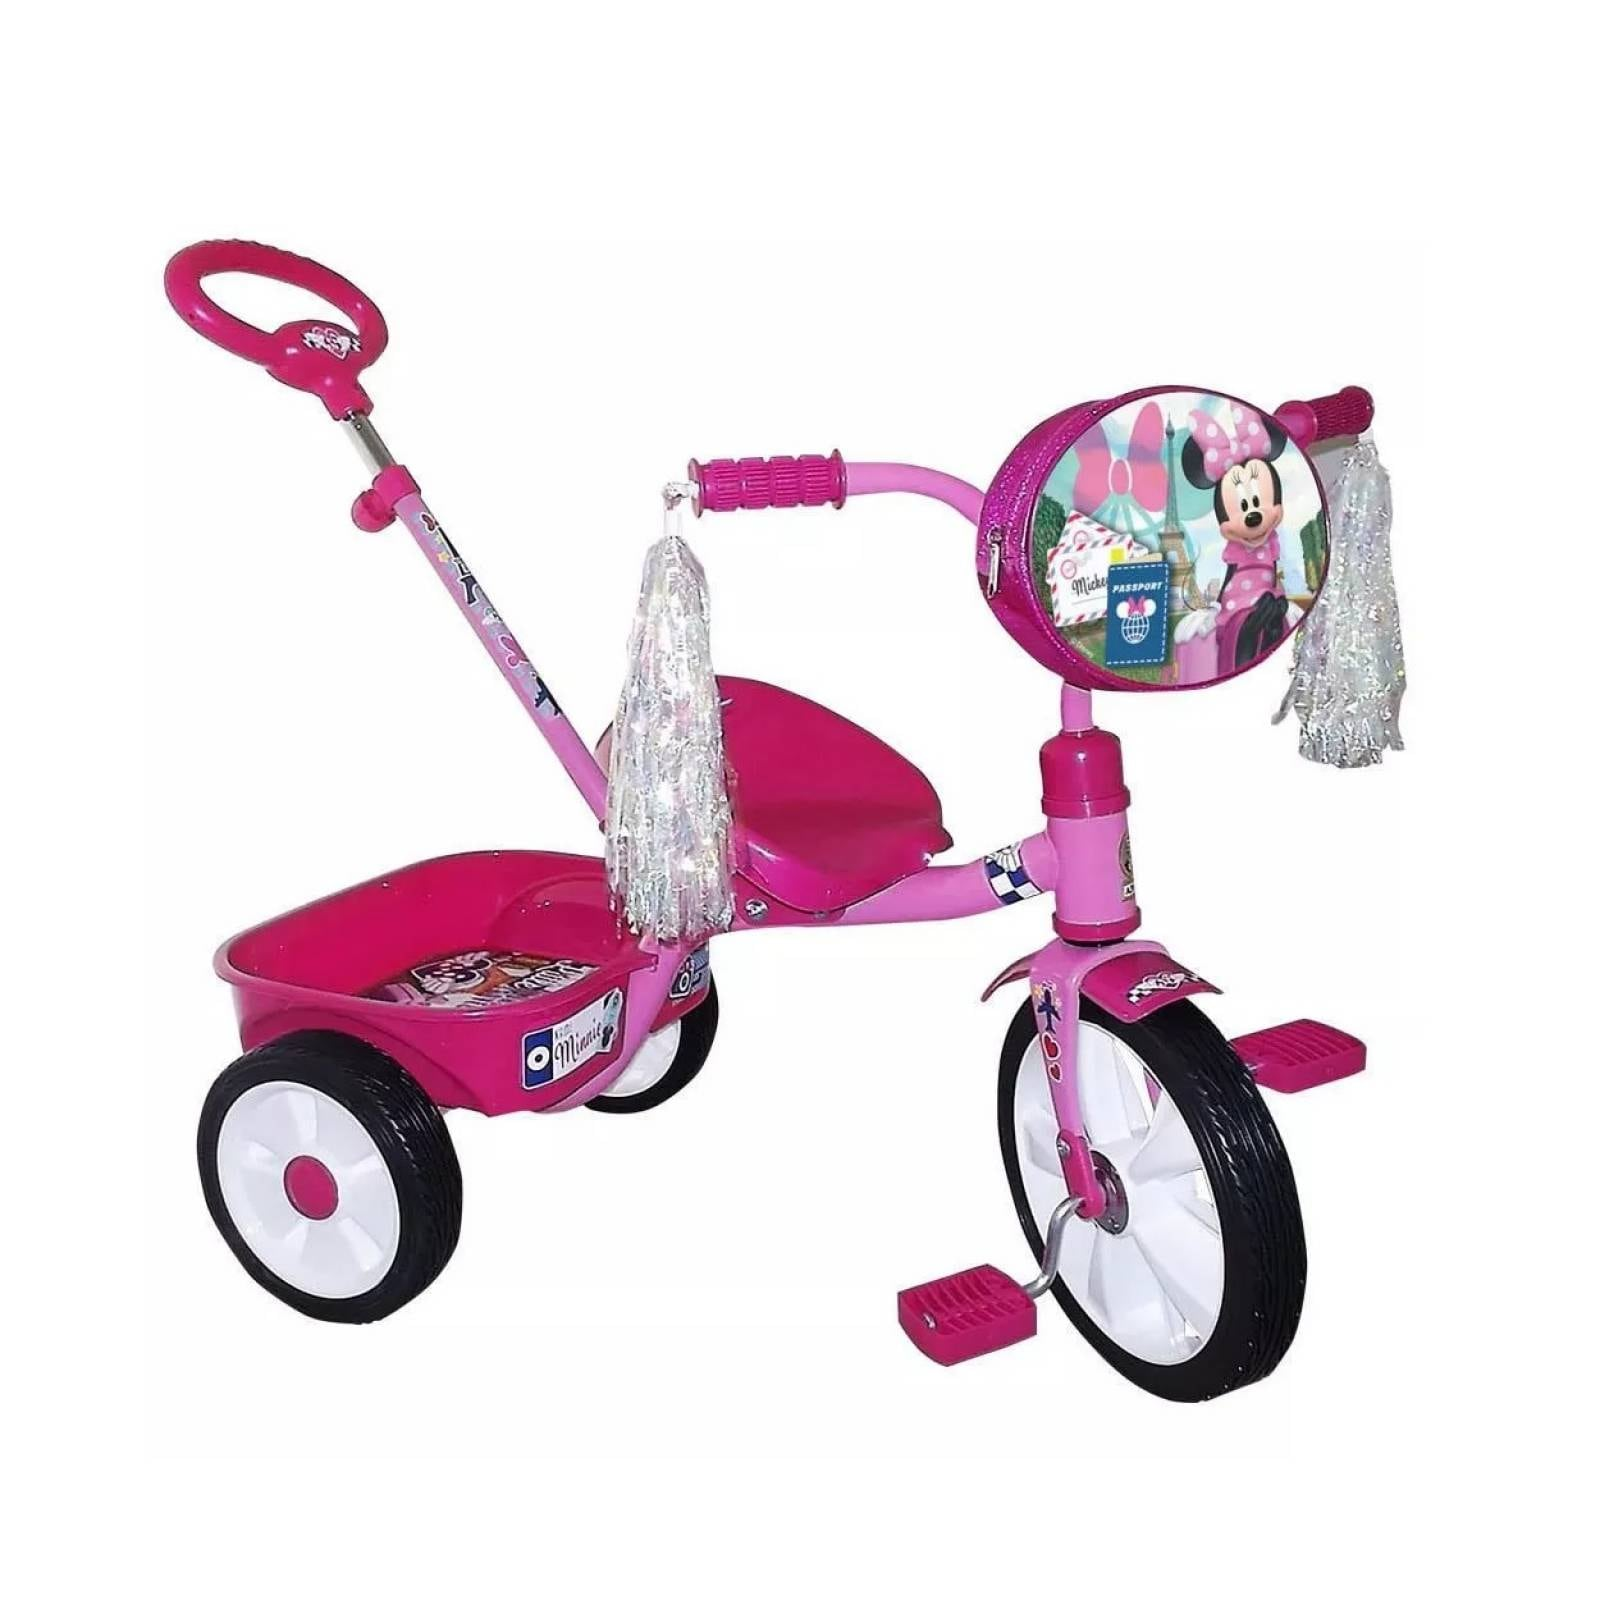 Triciclo con barra de empuje apache minnie r12 nina apache